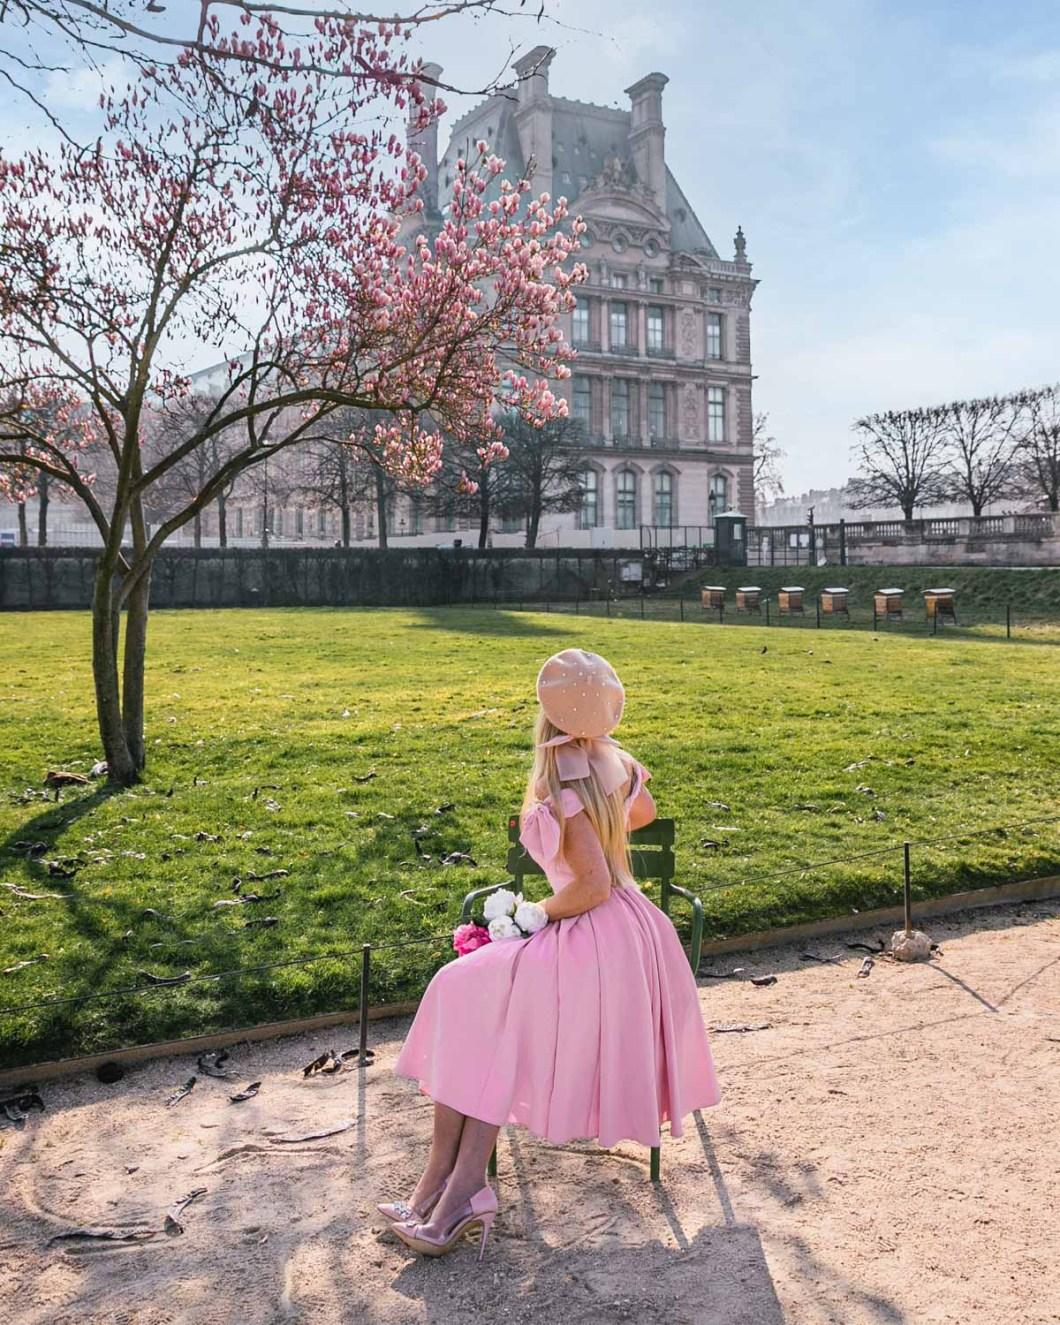 Magnolias in bloom in the Tuileries garden - Paris